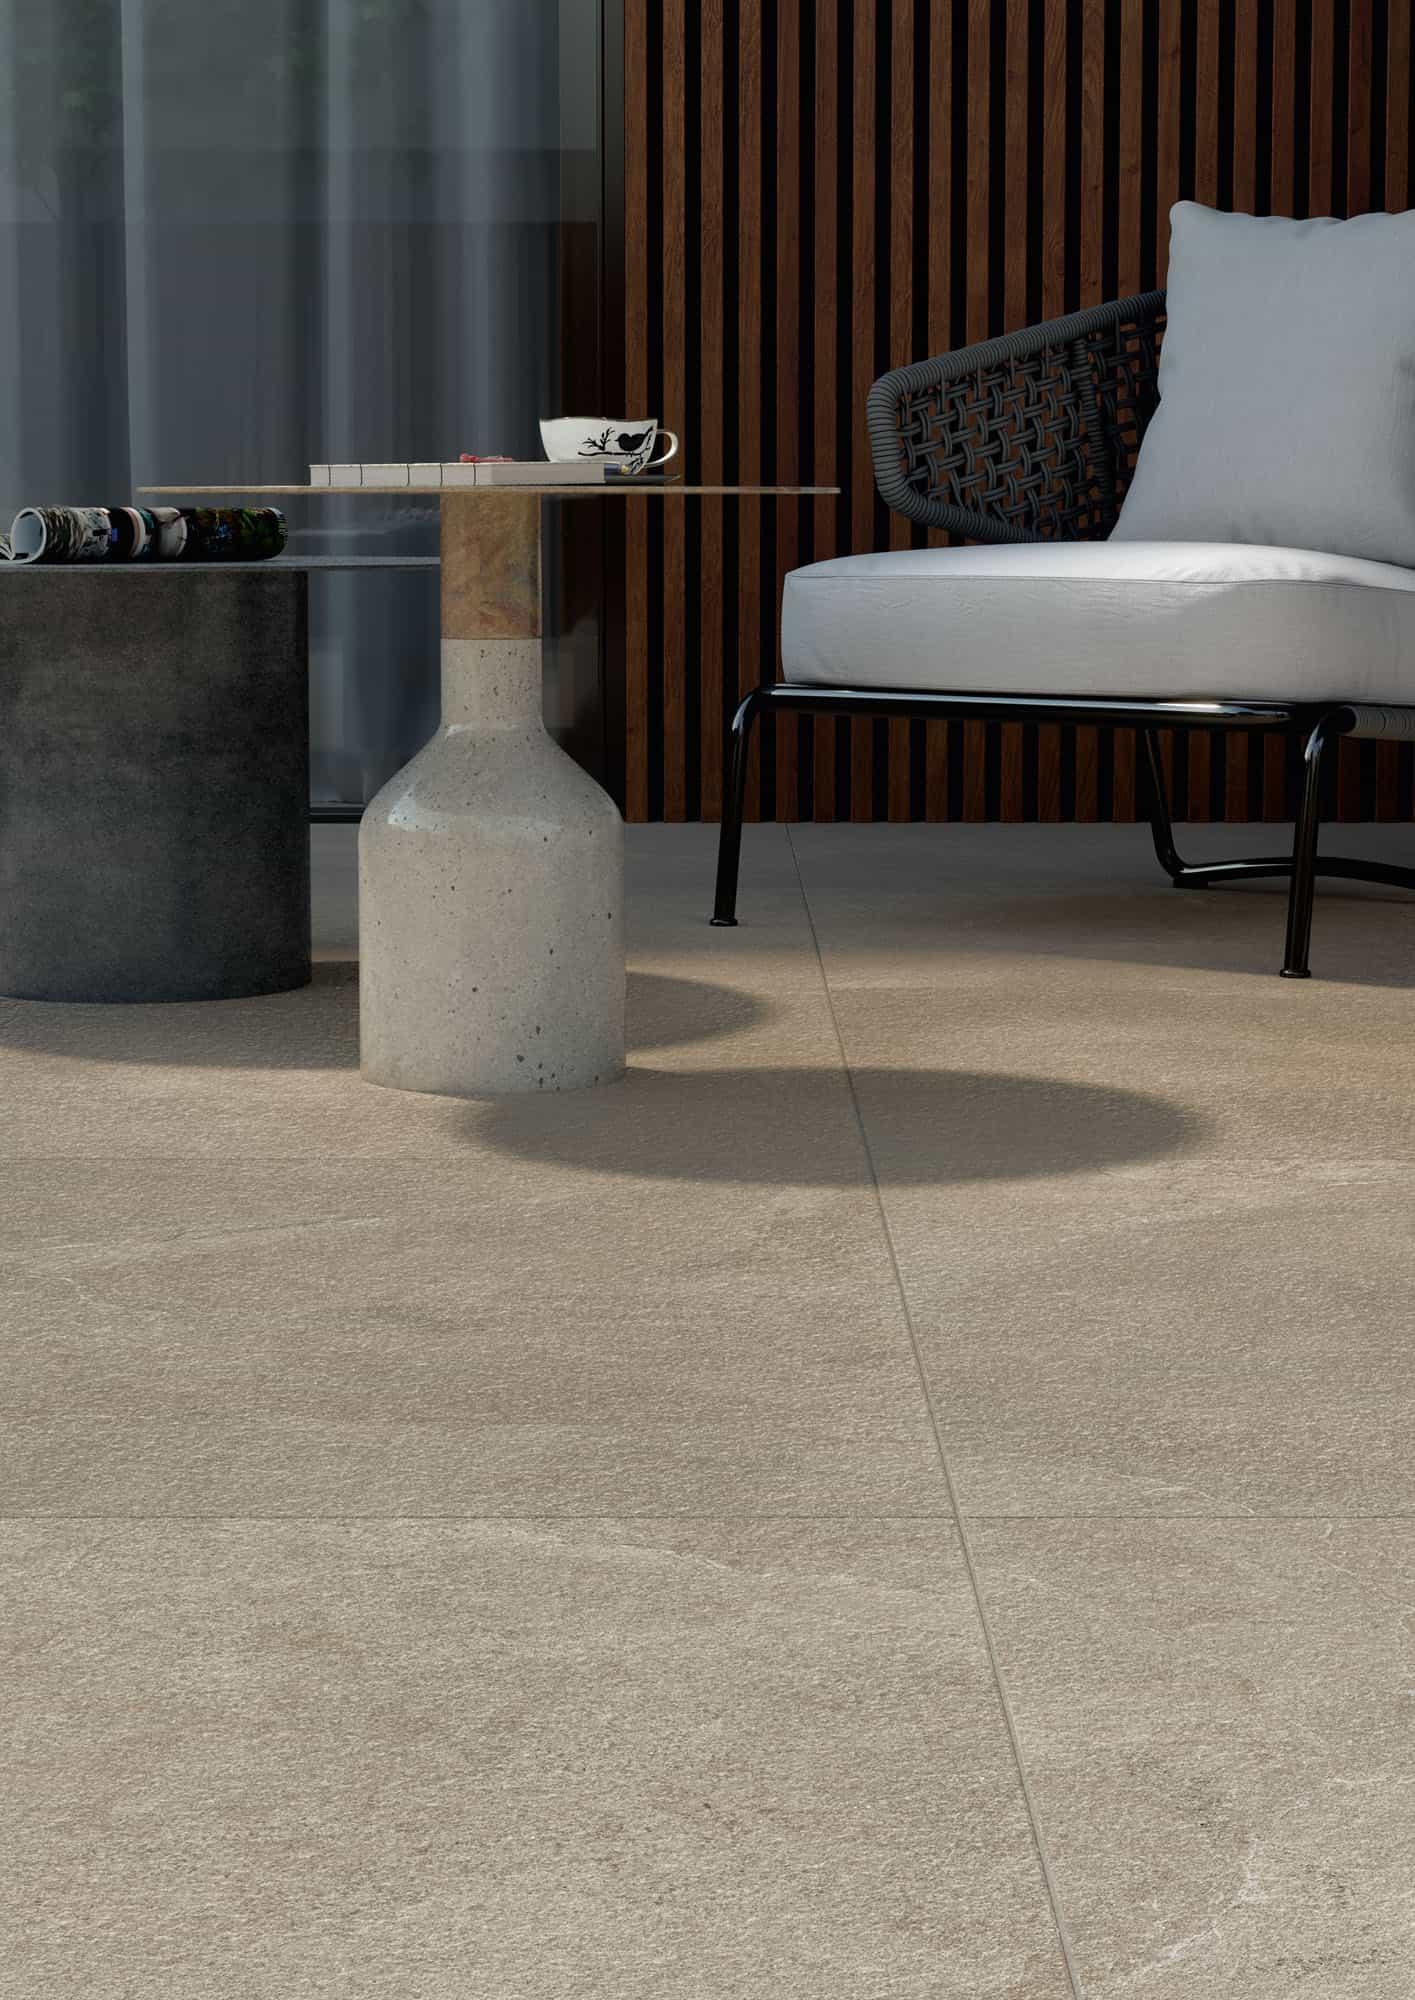 Wandtegels 90x90 - Lithos Desert - Lappato